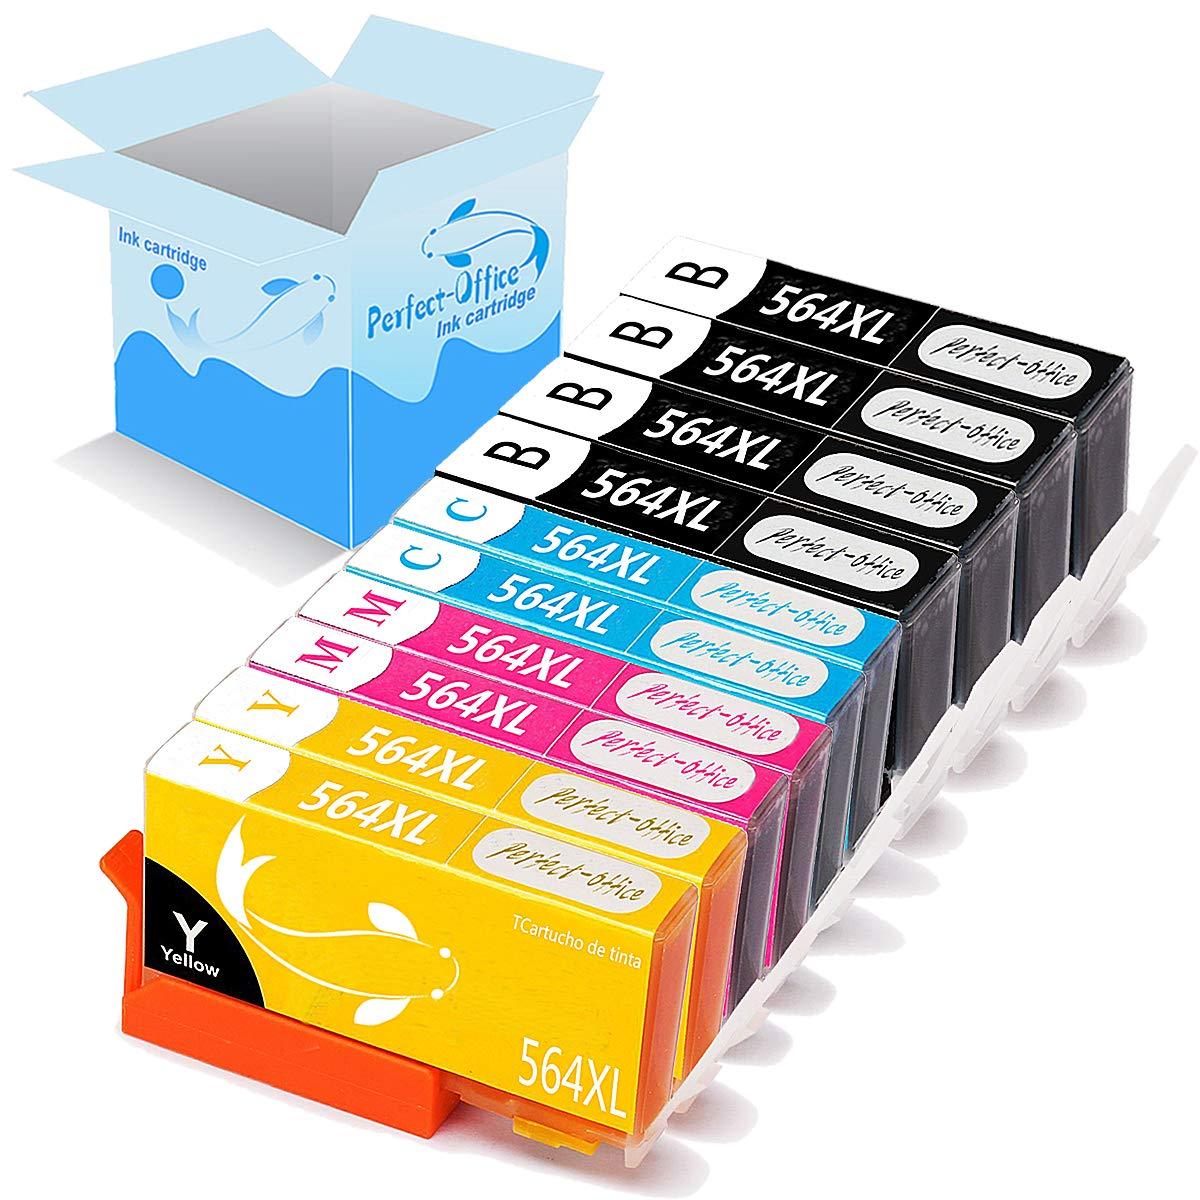 Amazon.com: Perfect-Office 8 paquete 564 cartucho de ...